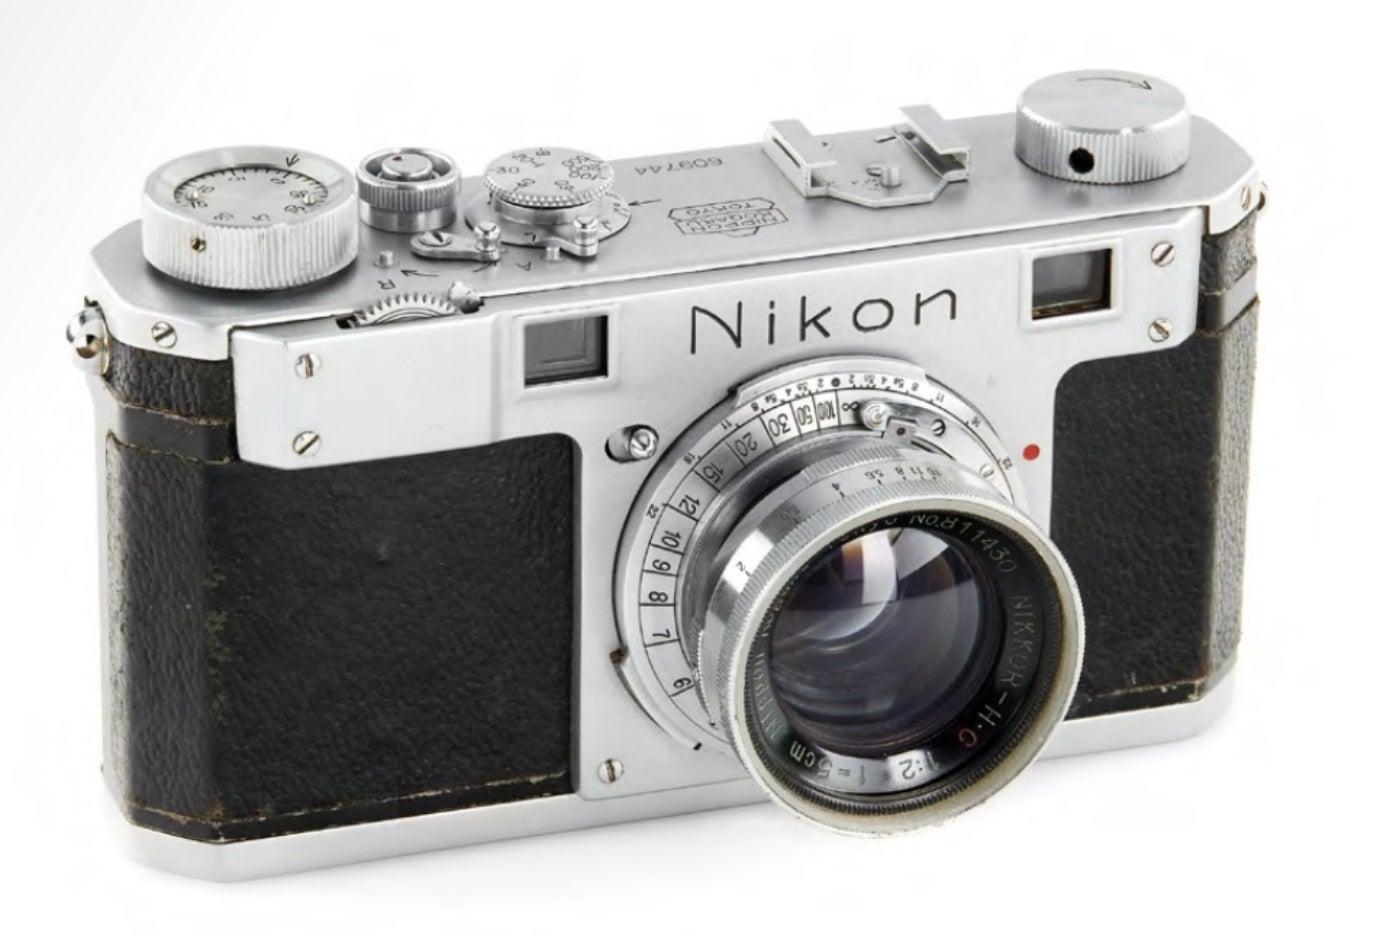 The Nikon One rangefinder